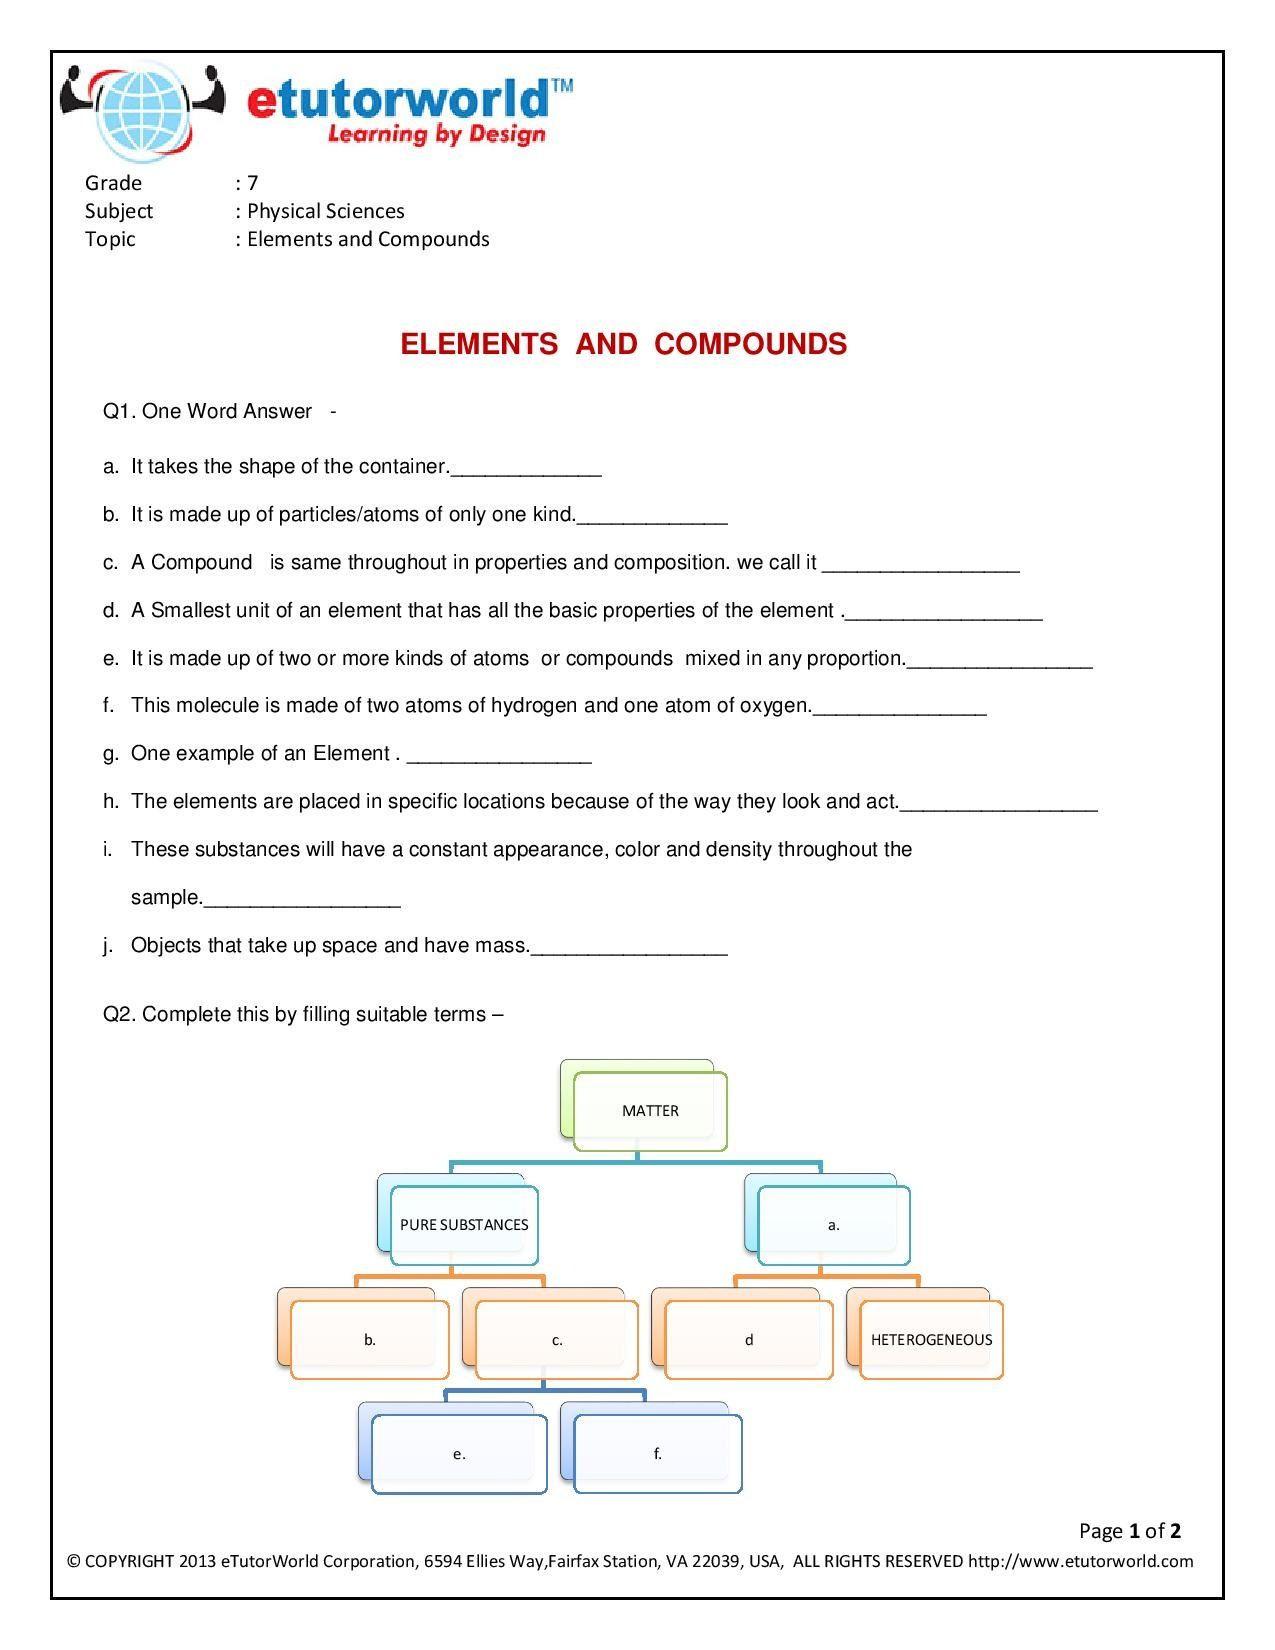 7th Grade Science Worksheets Printable Science Worksheets for Grade 7